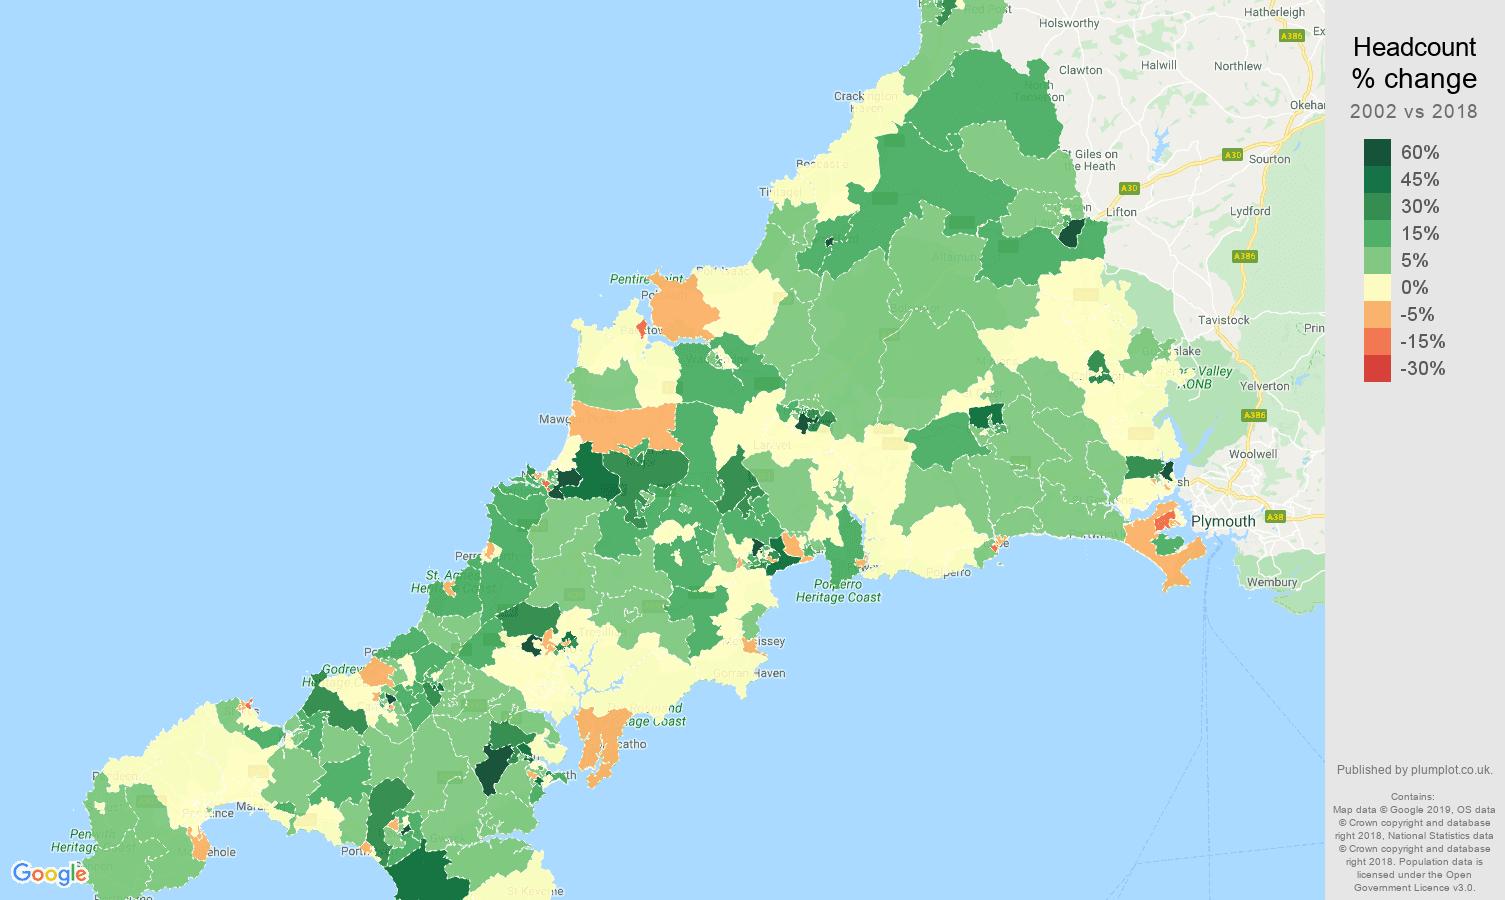 Cornwall headcount change map